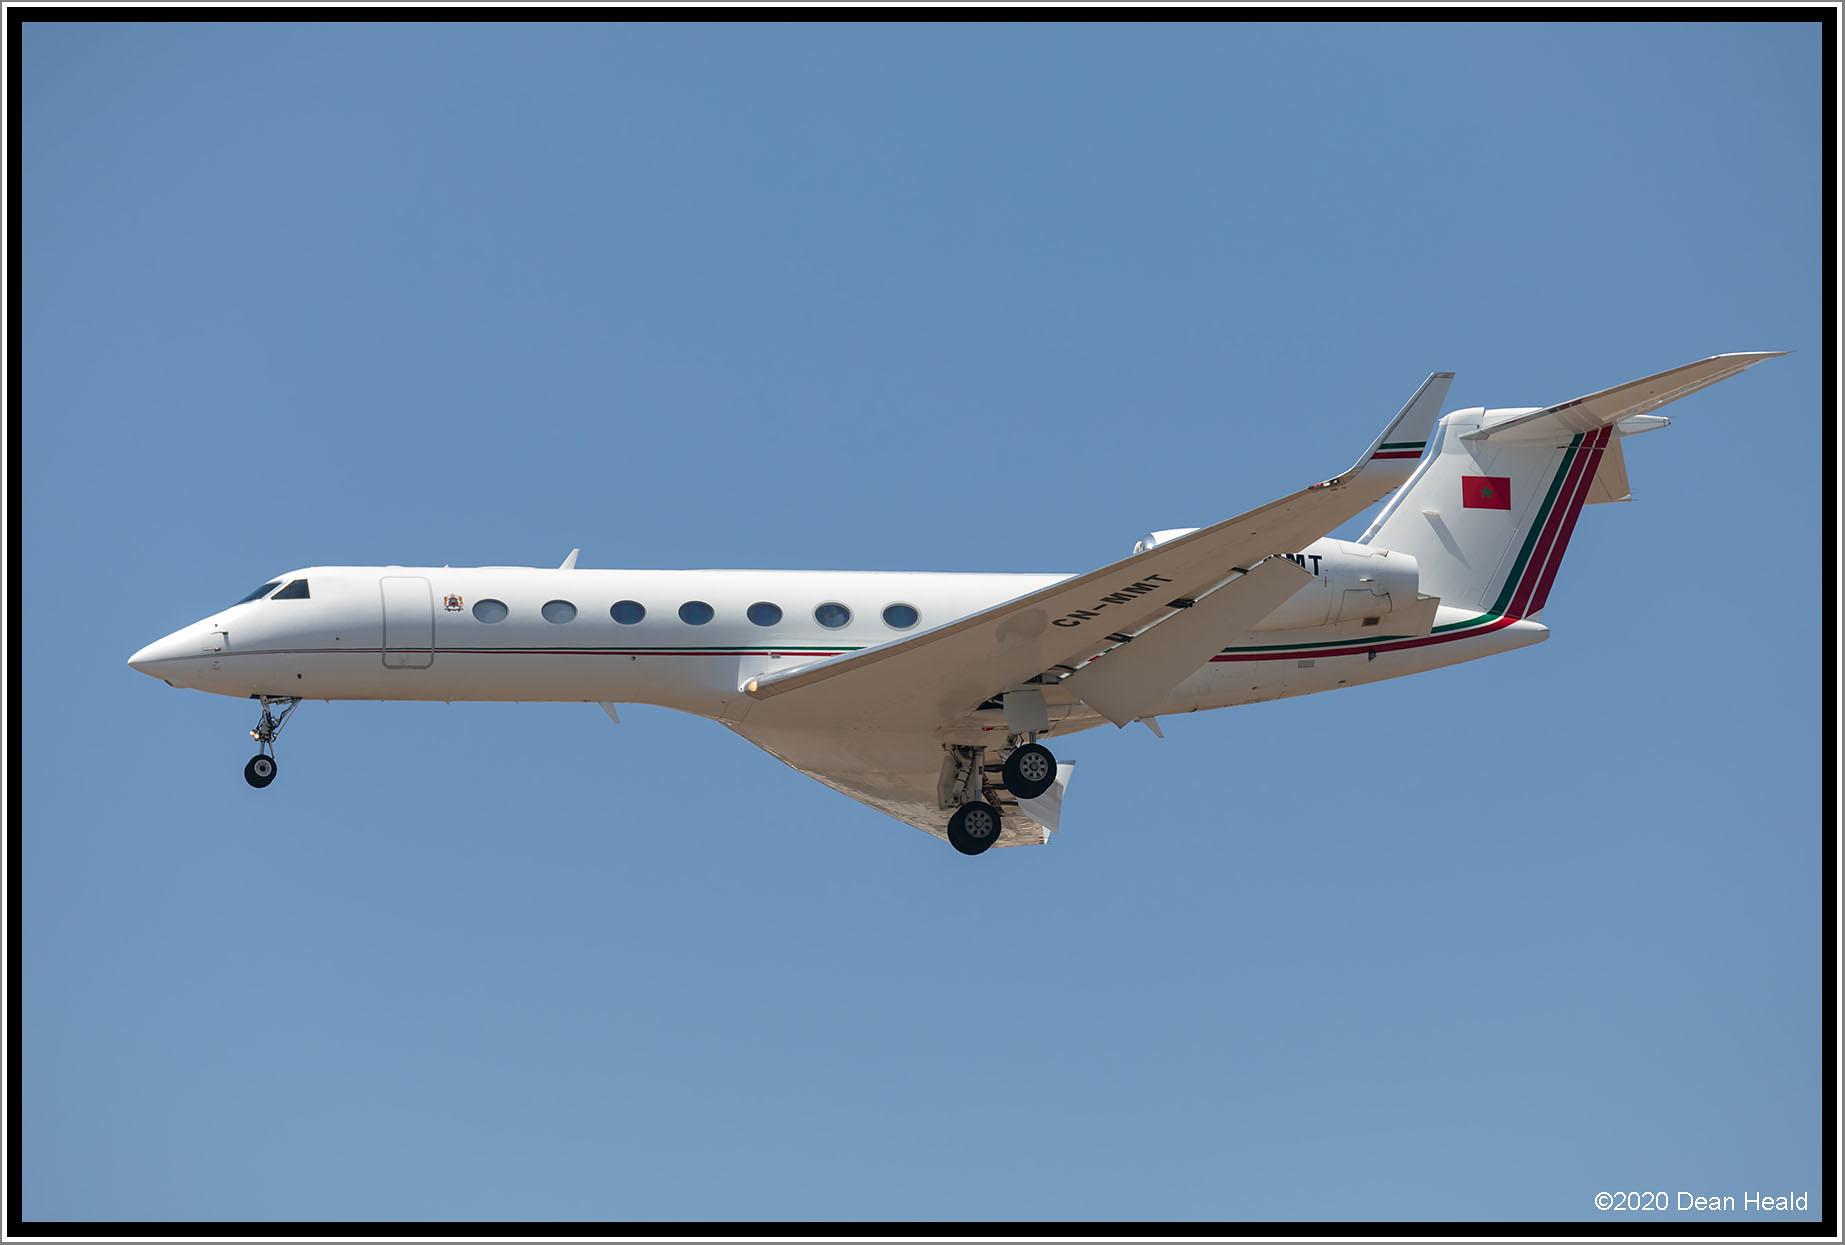 FRA: Avions VIP, Liaison & ECM - Page 24 50121144258_5da02e2afc_k